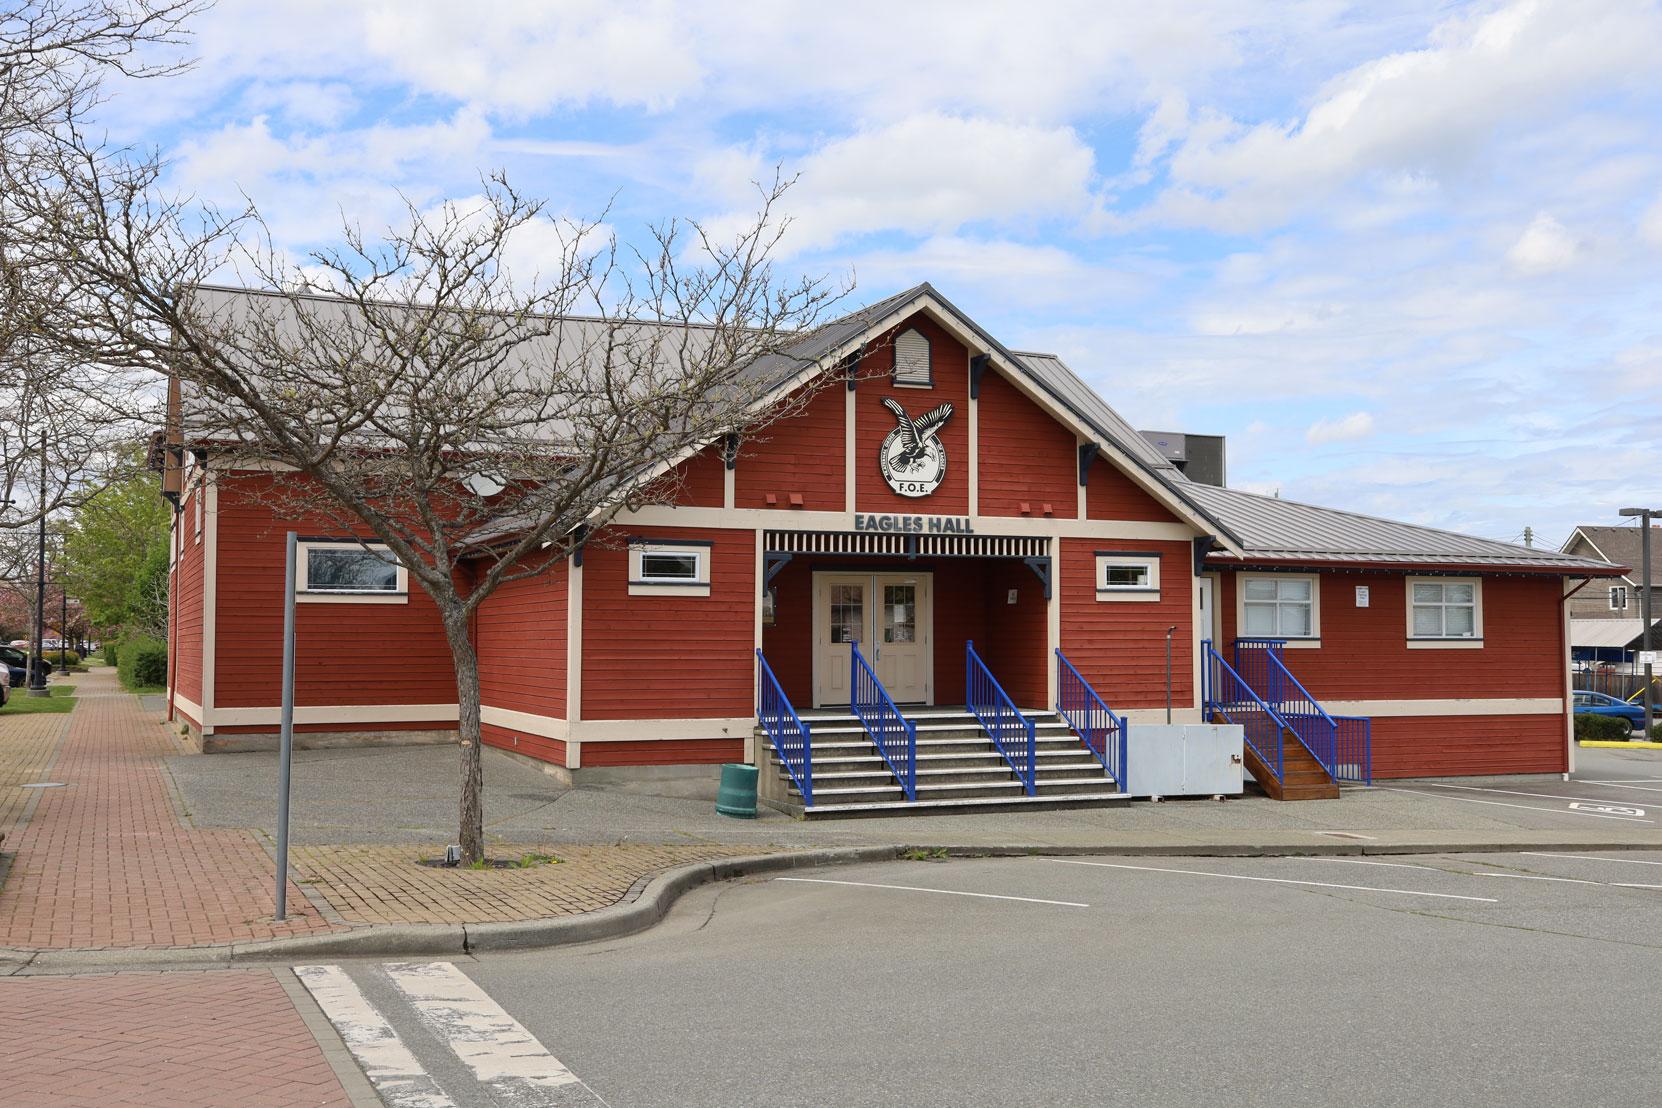 The Fraternal Order Of Eagles (F.O.E.) Hall, 921 1st Avenue, Ladysmith, B.C.